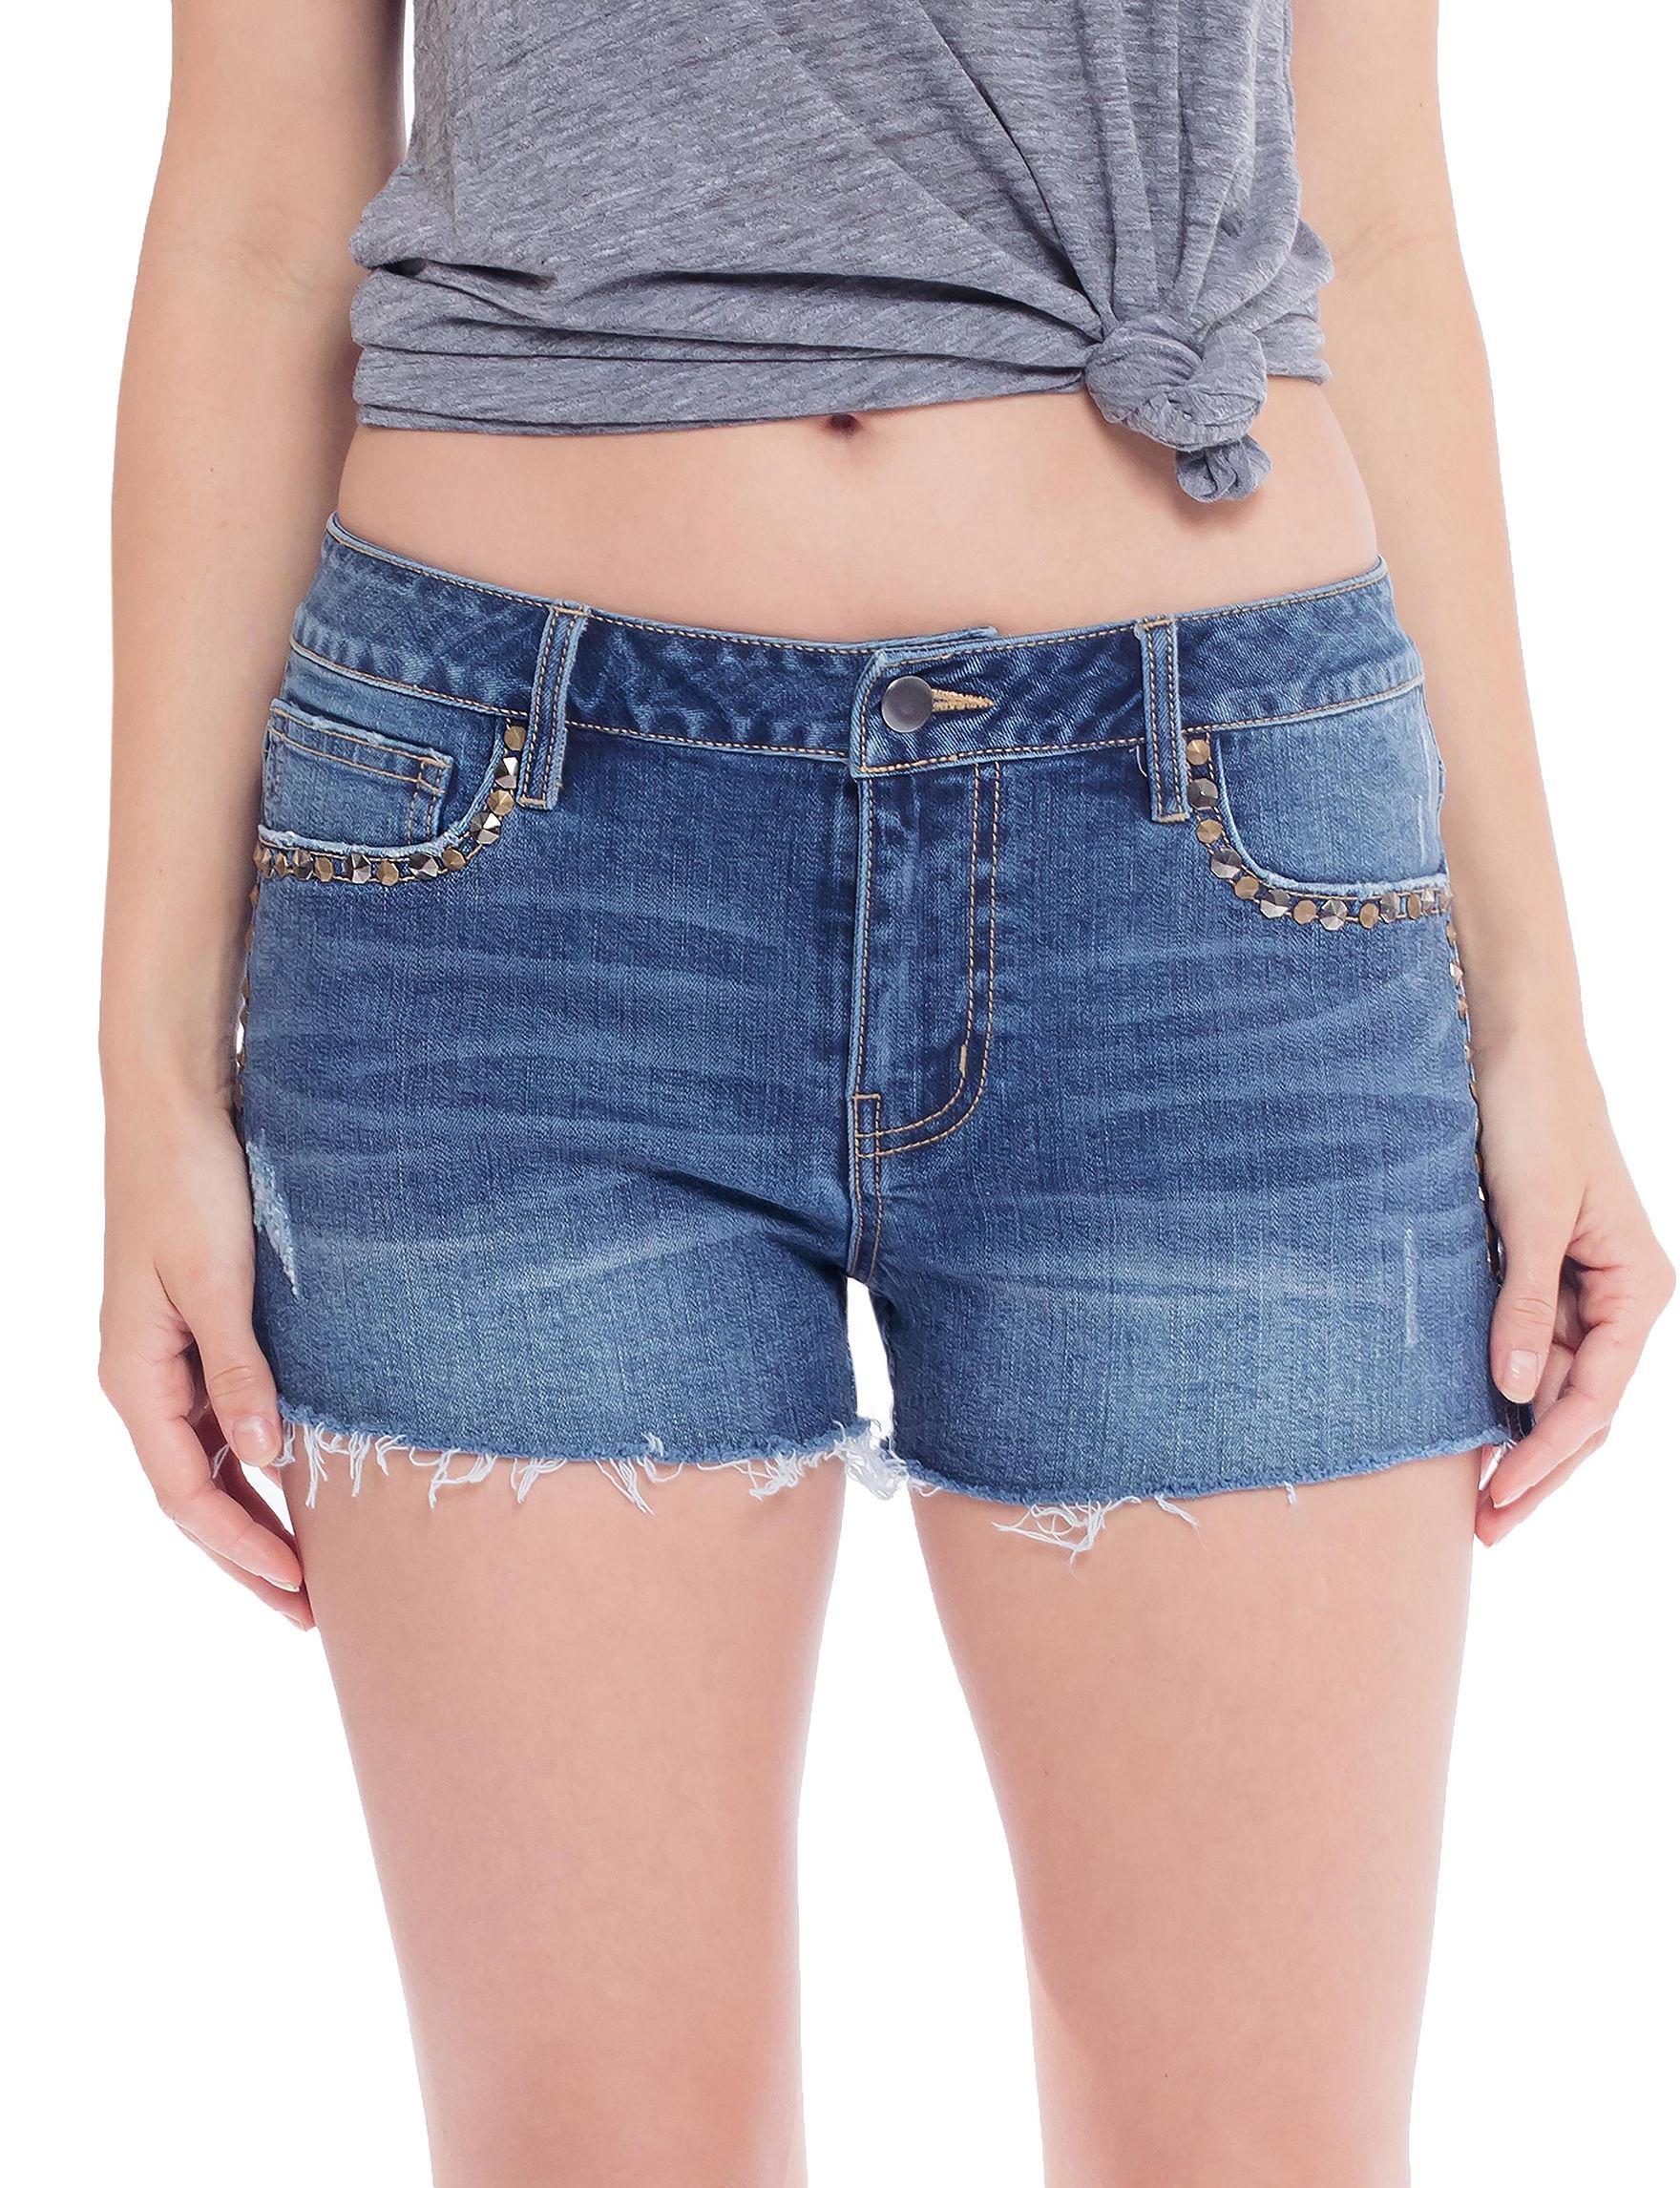 C + J Collections Blue Denim Shorts